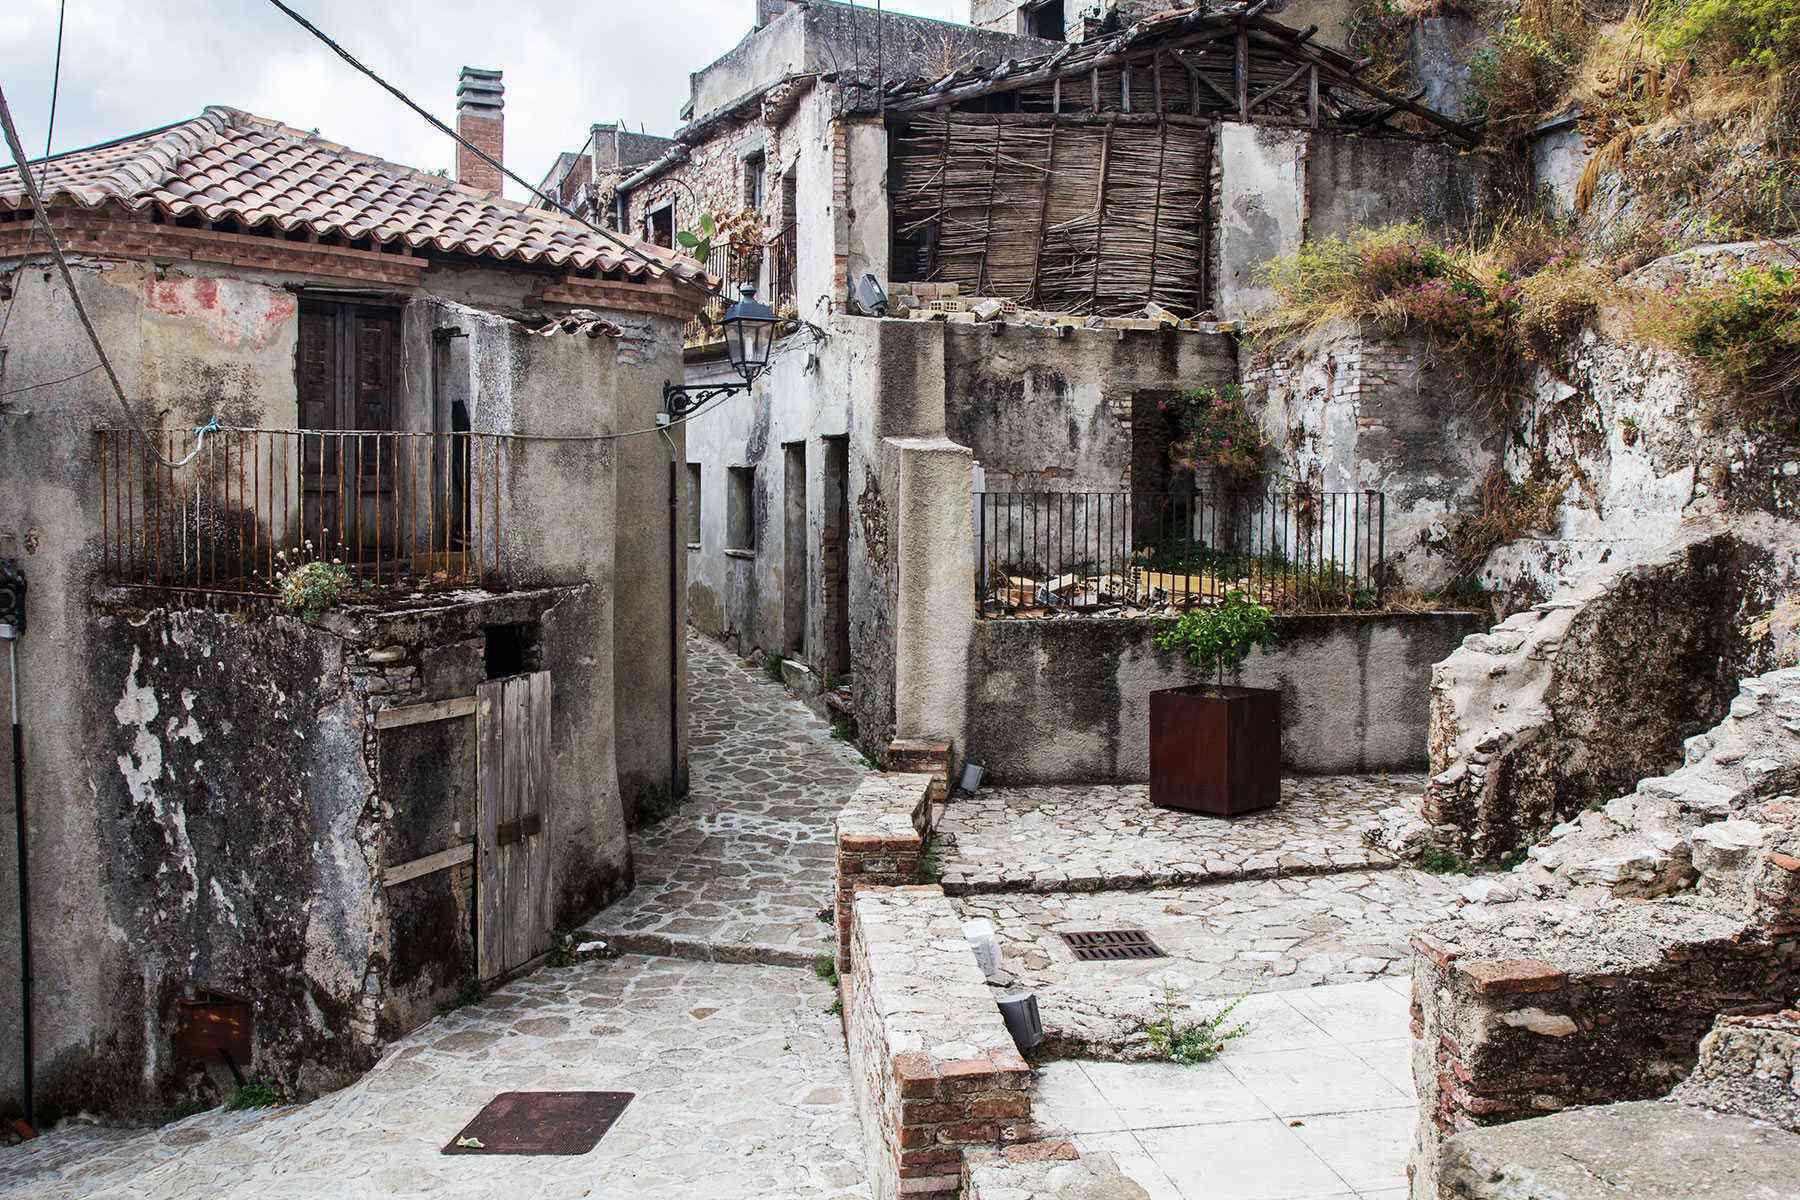 Medieval-Italian-Towns-Bova-2